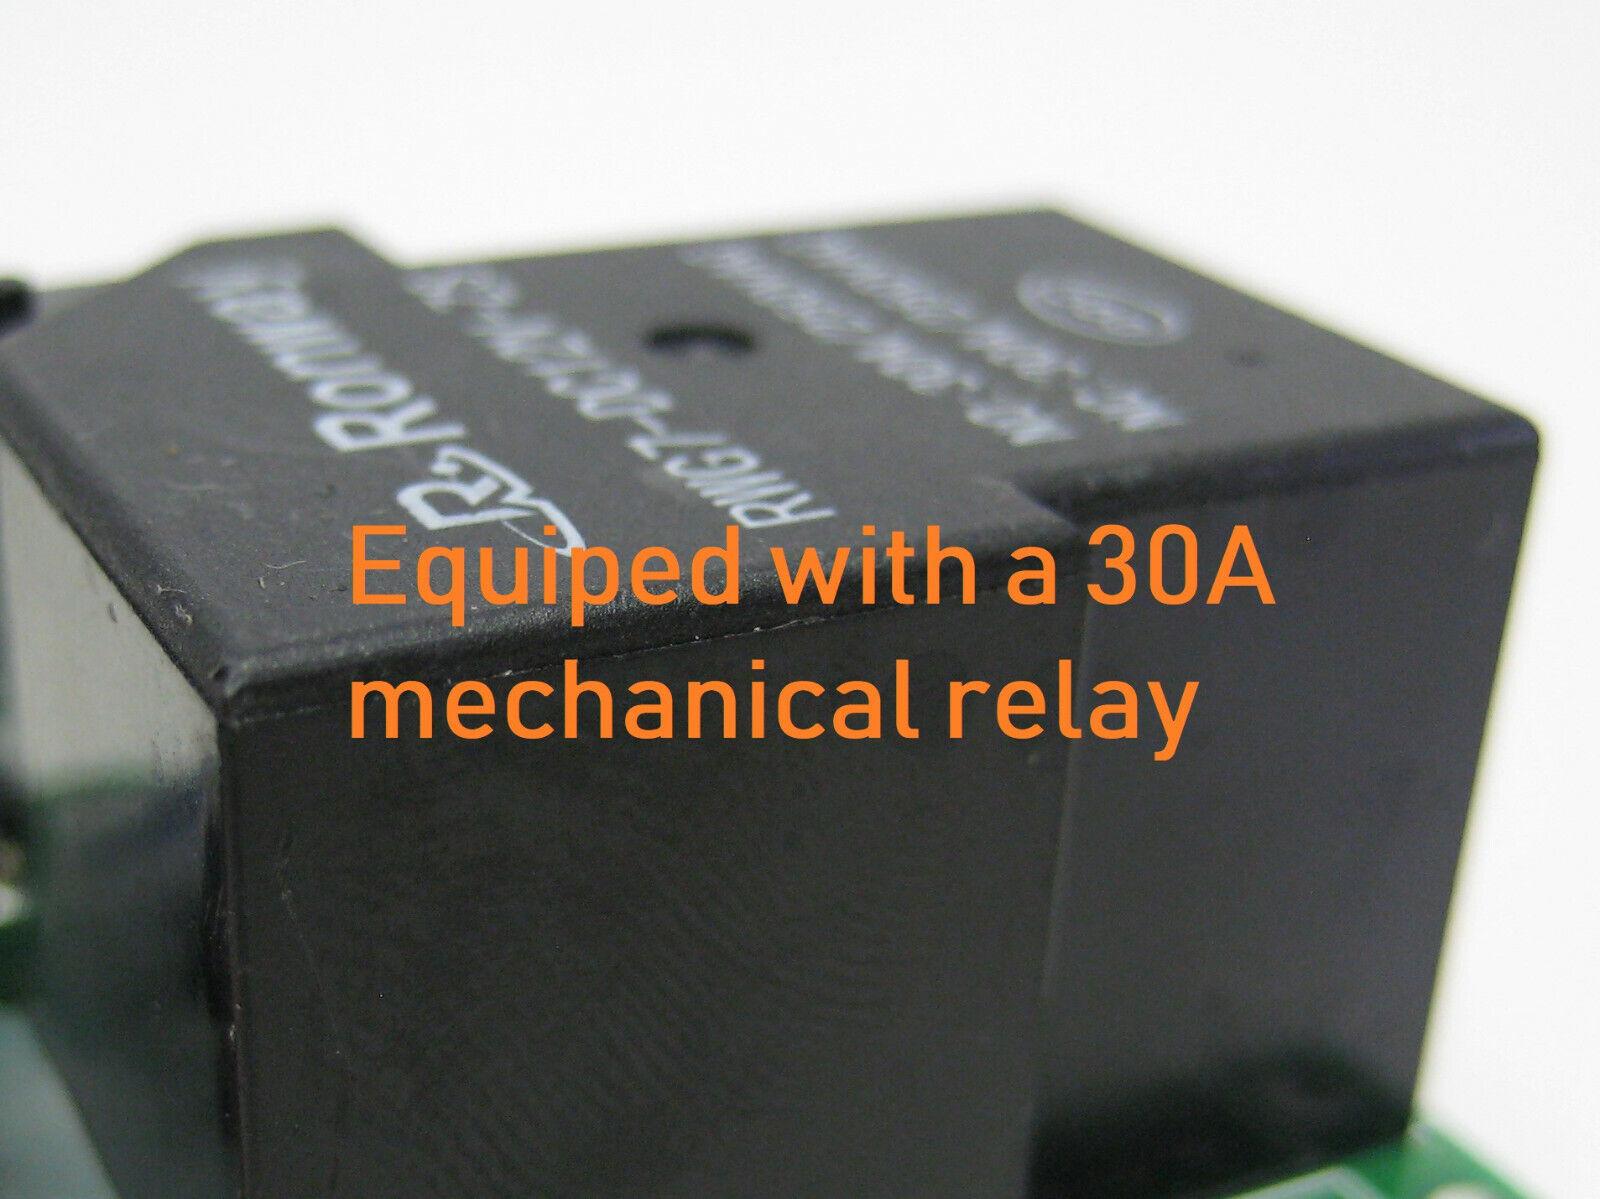 как выглядит Система автоматики для дома MSD 12V DC on off relay switch remote control transmitter with 12v 20A output фото